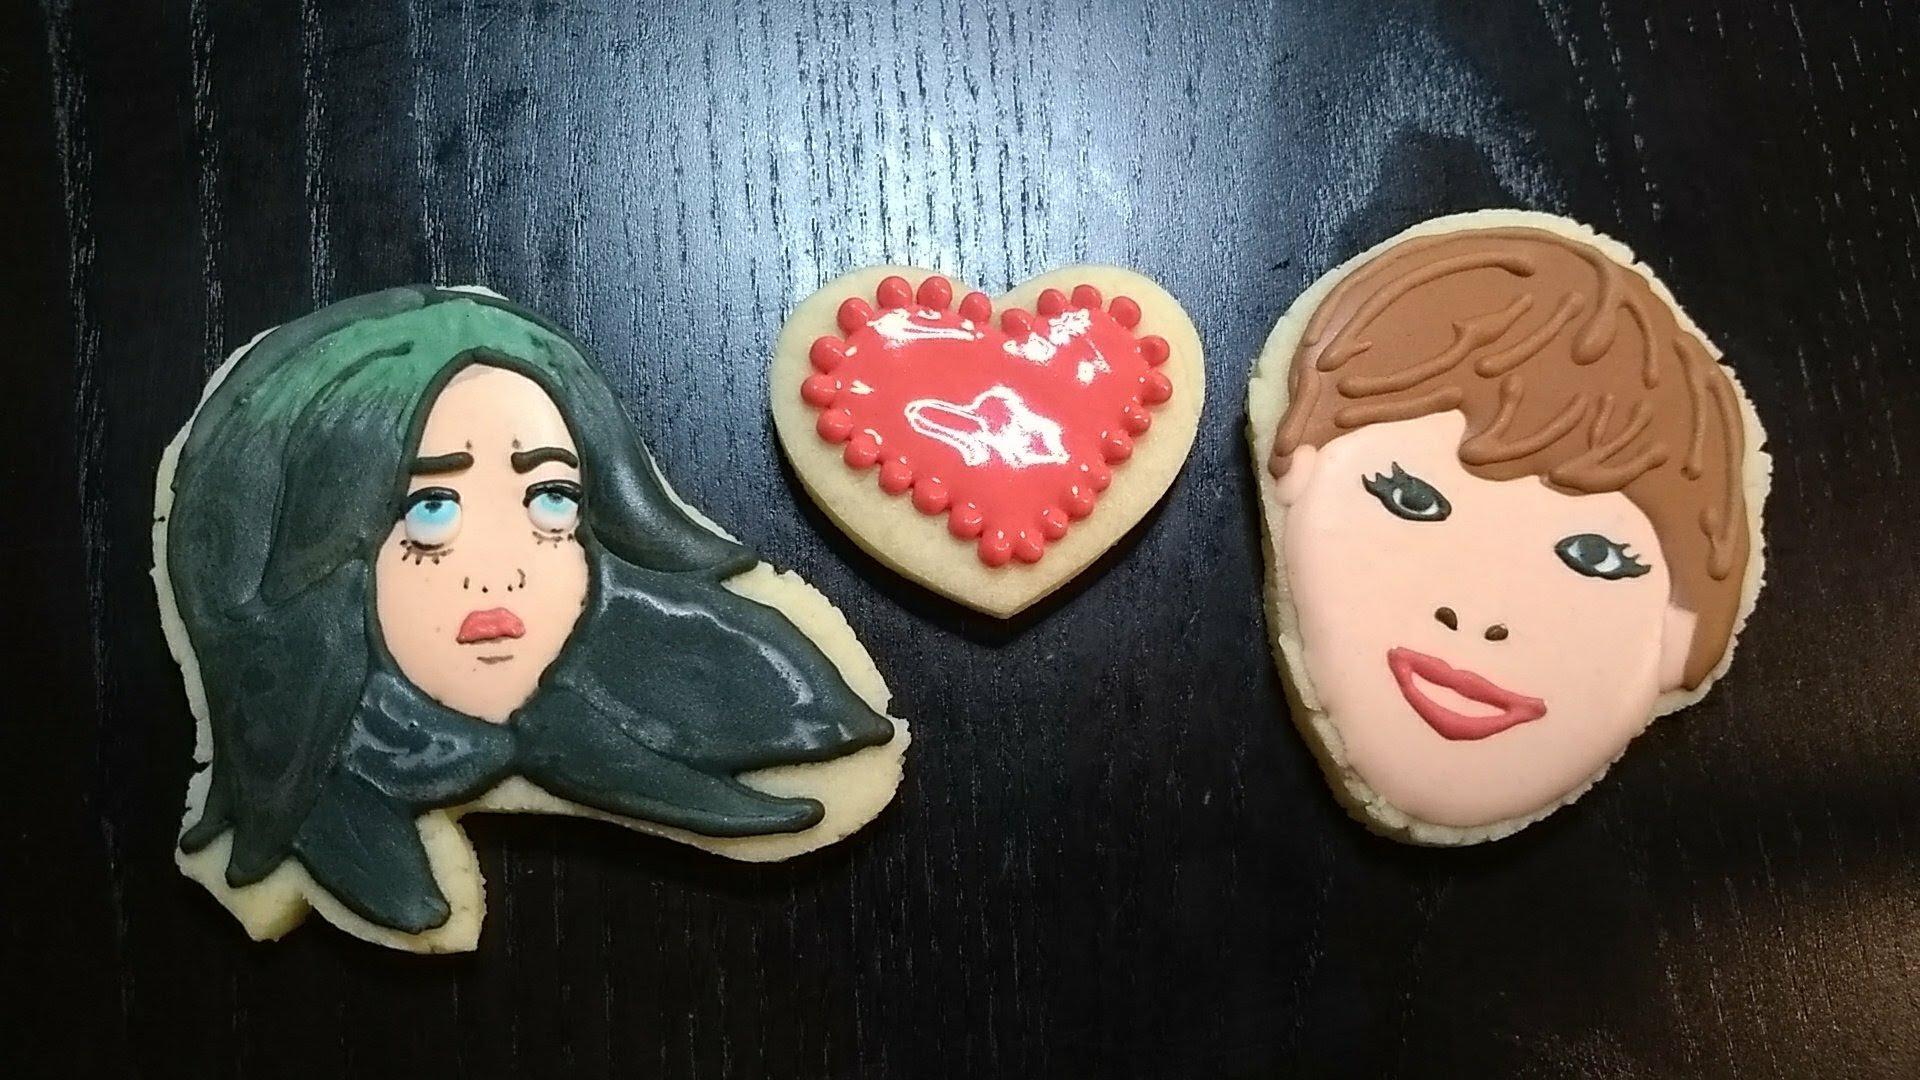 tourette awareness i love billie eilish royal icing sugar cookie